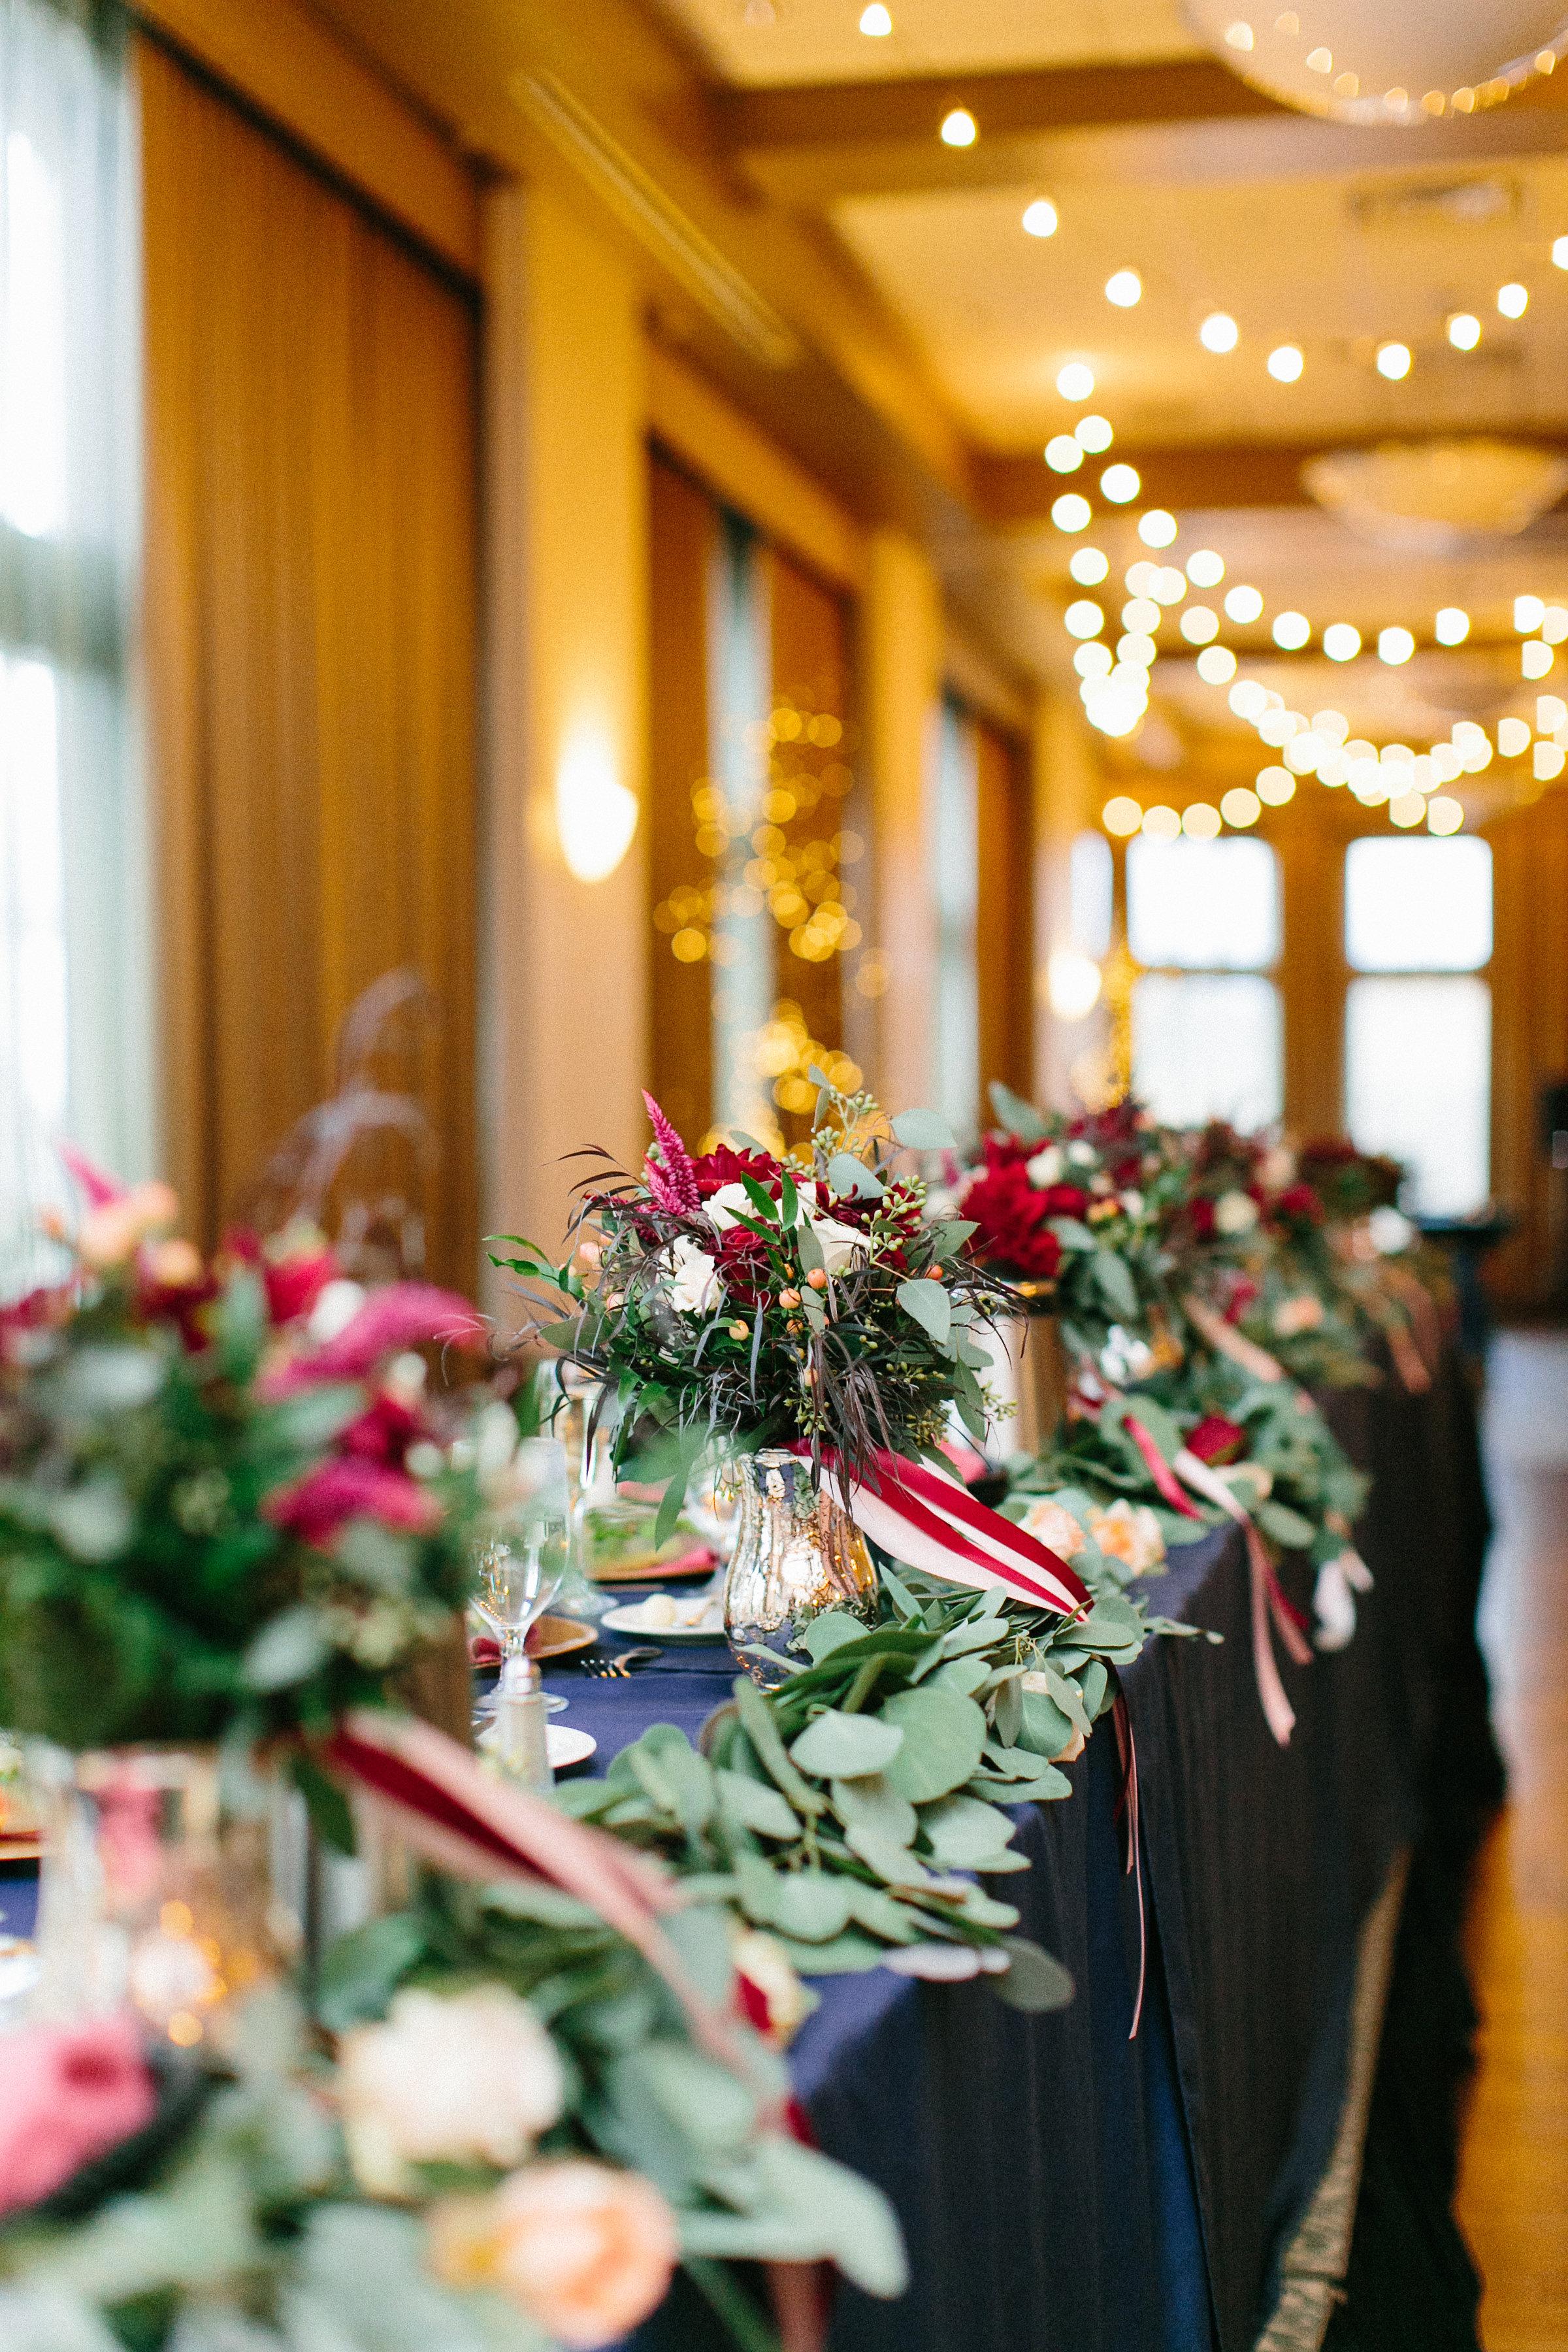 2017_Carly_Milbrath_Jefferson_Street_Inn_Wedding_Wausau_WI_426.JPG